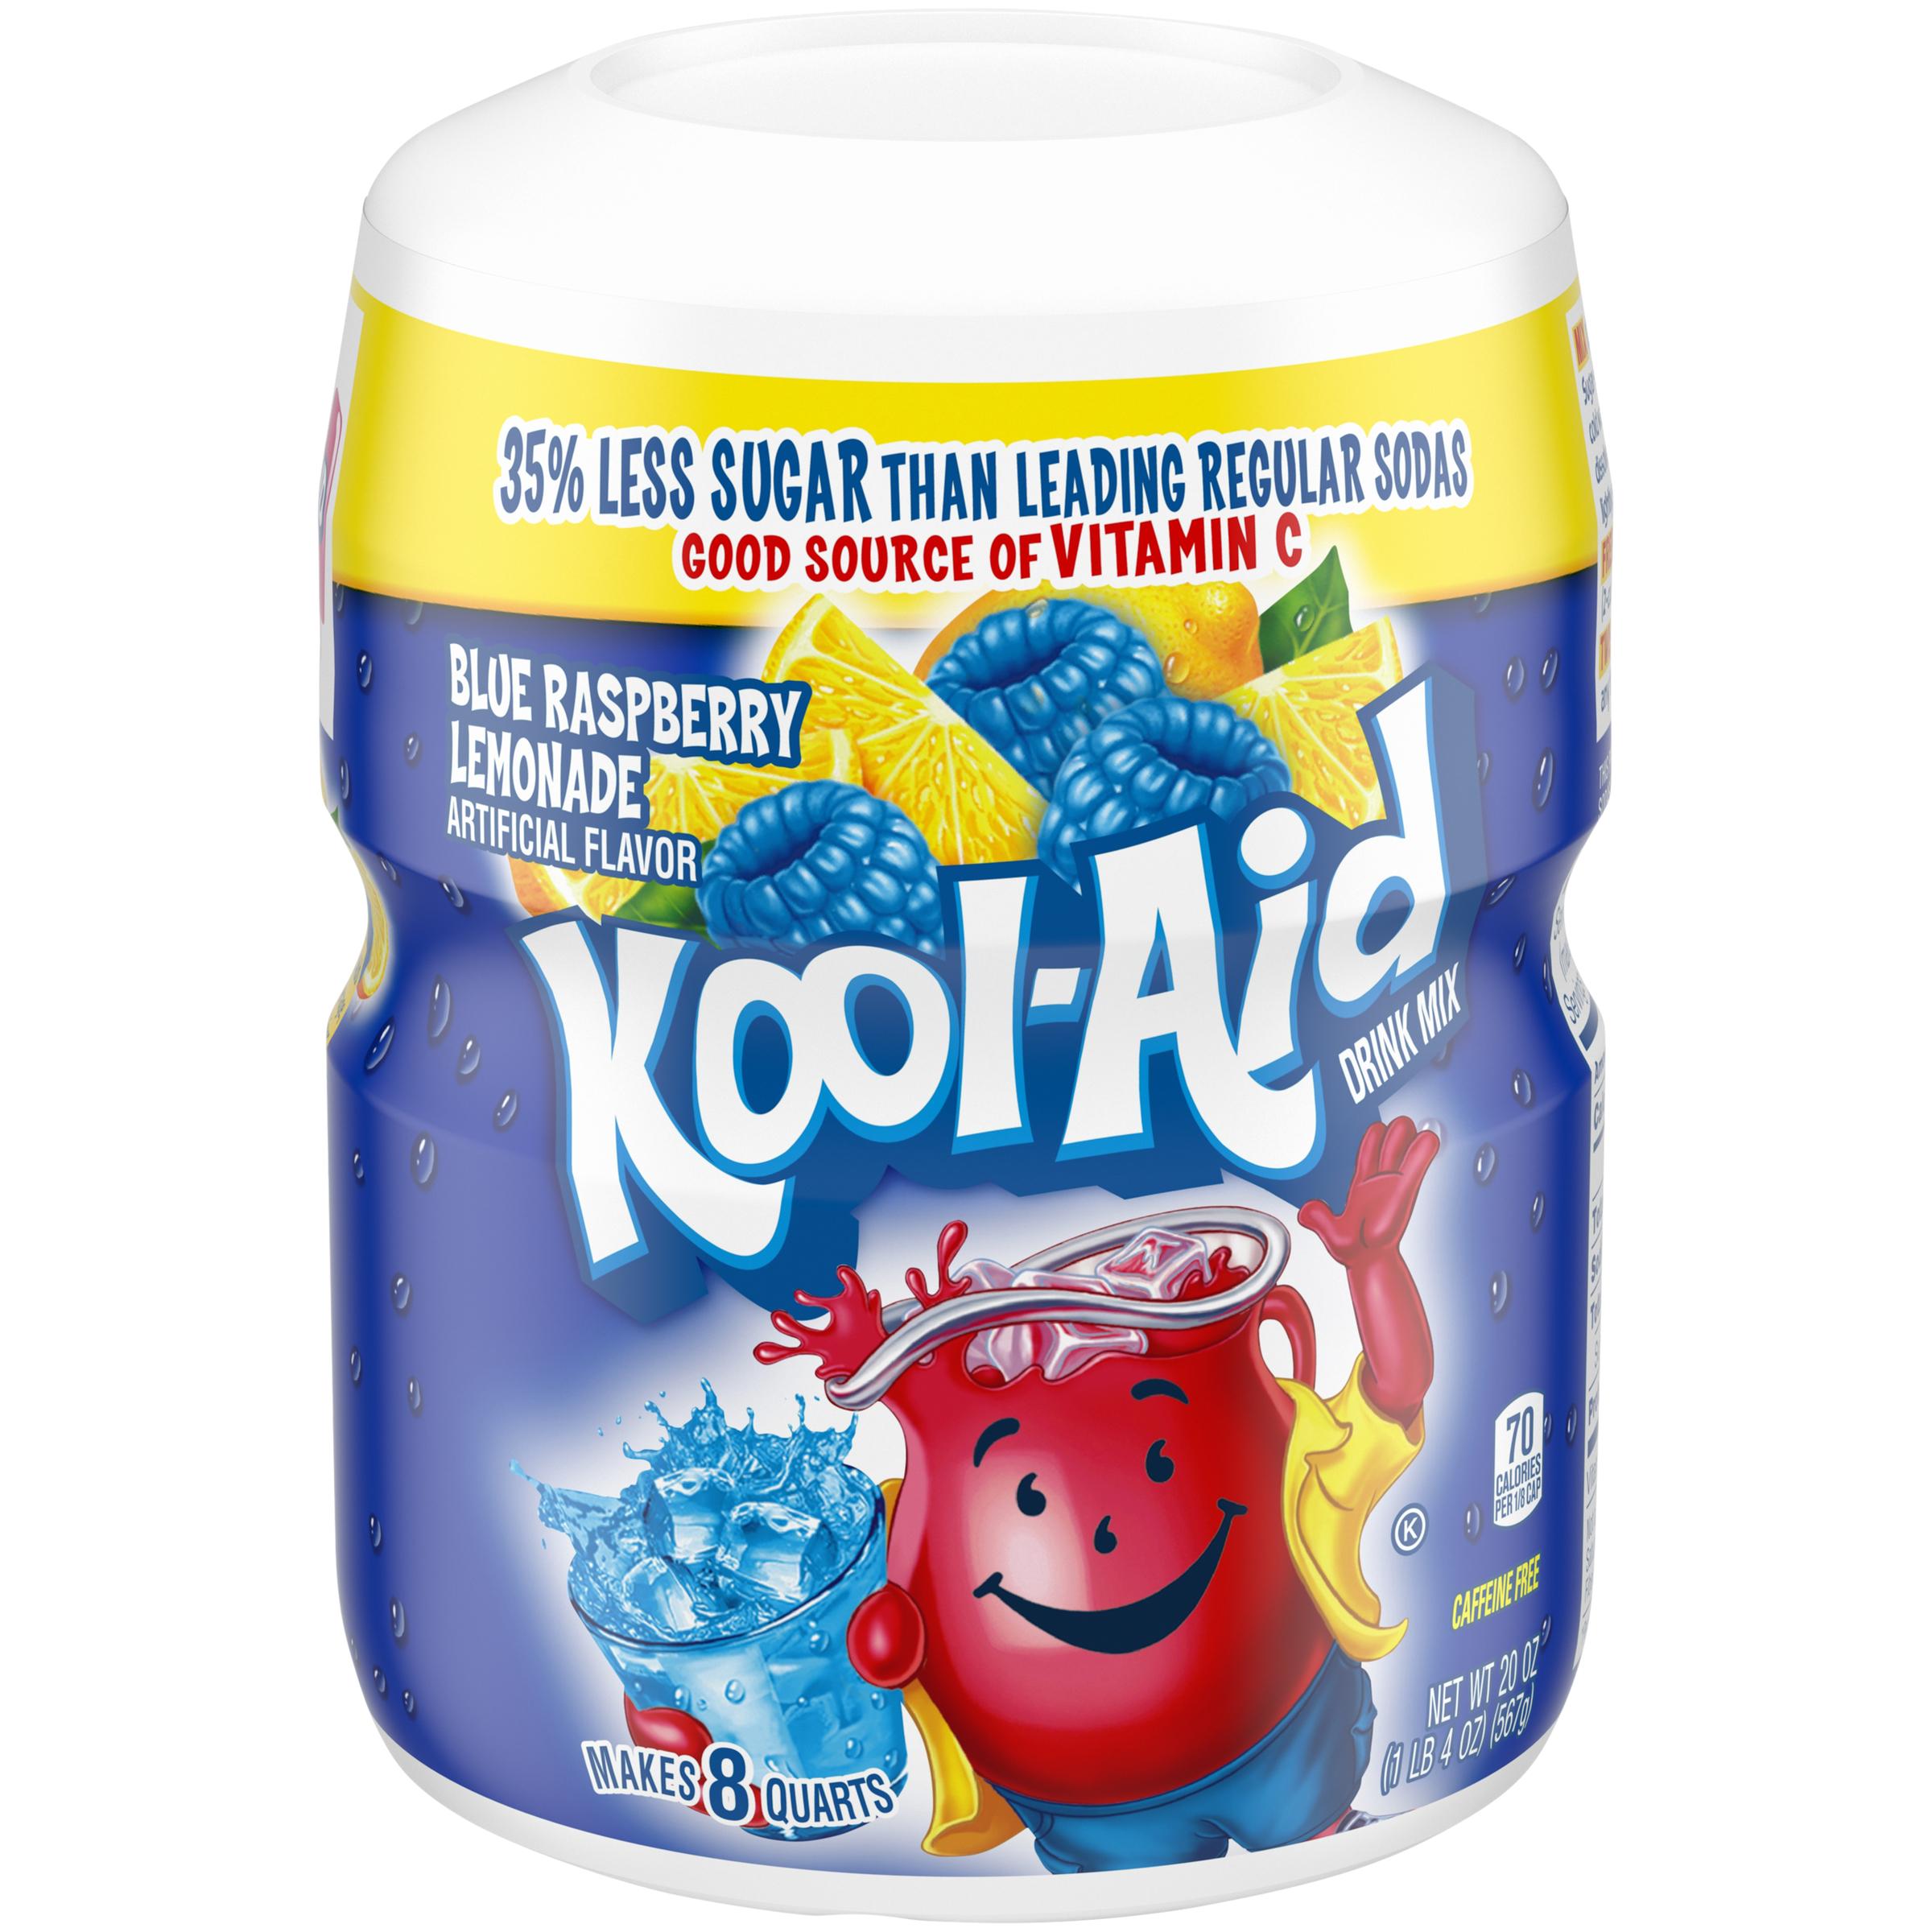 KOOL-AID Twists Ice Blue Raspberry Lemonade  Drink Mix Sugar Sweetened 20 oz Canister image